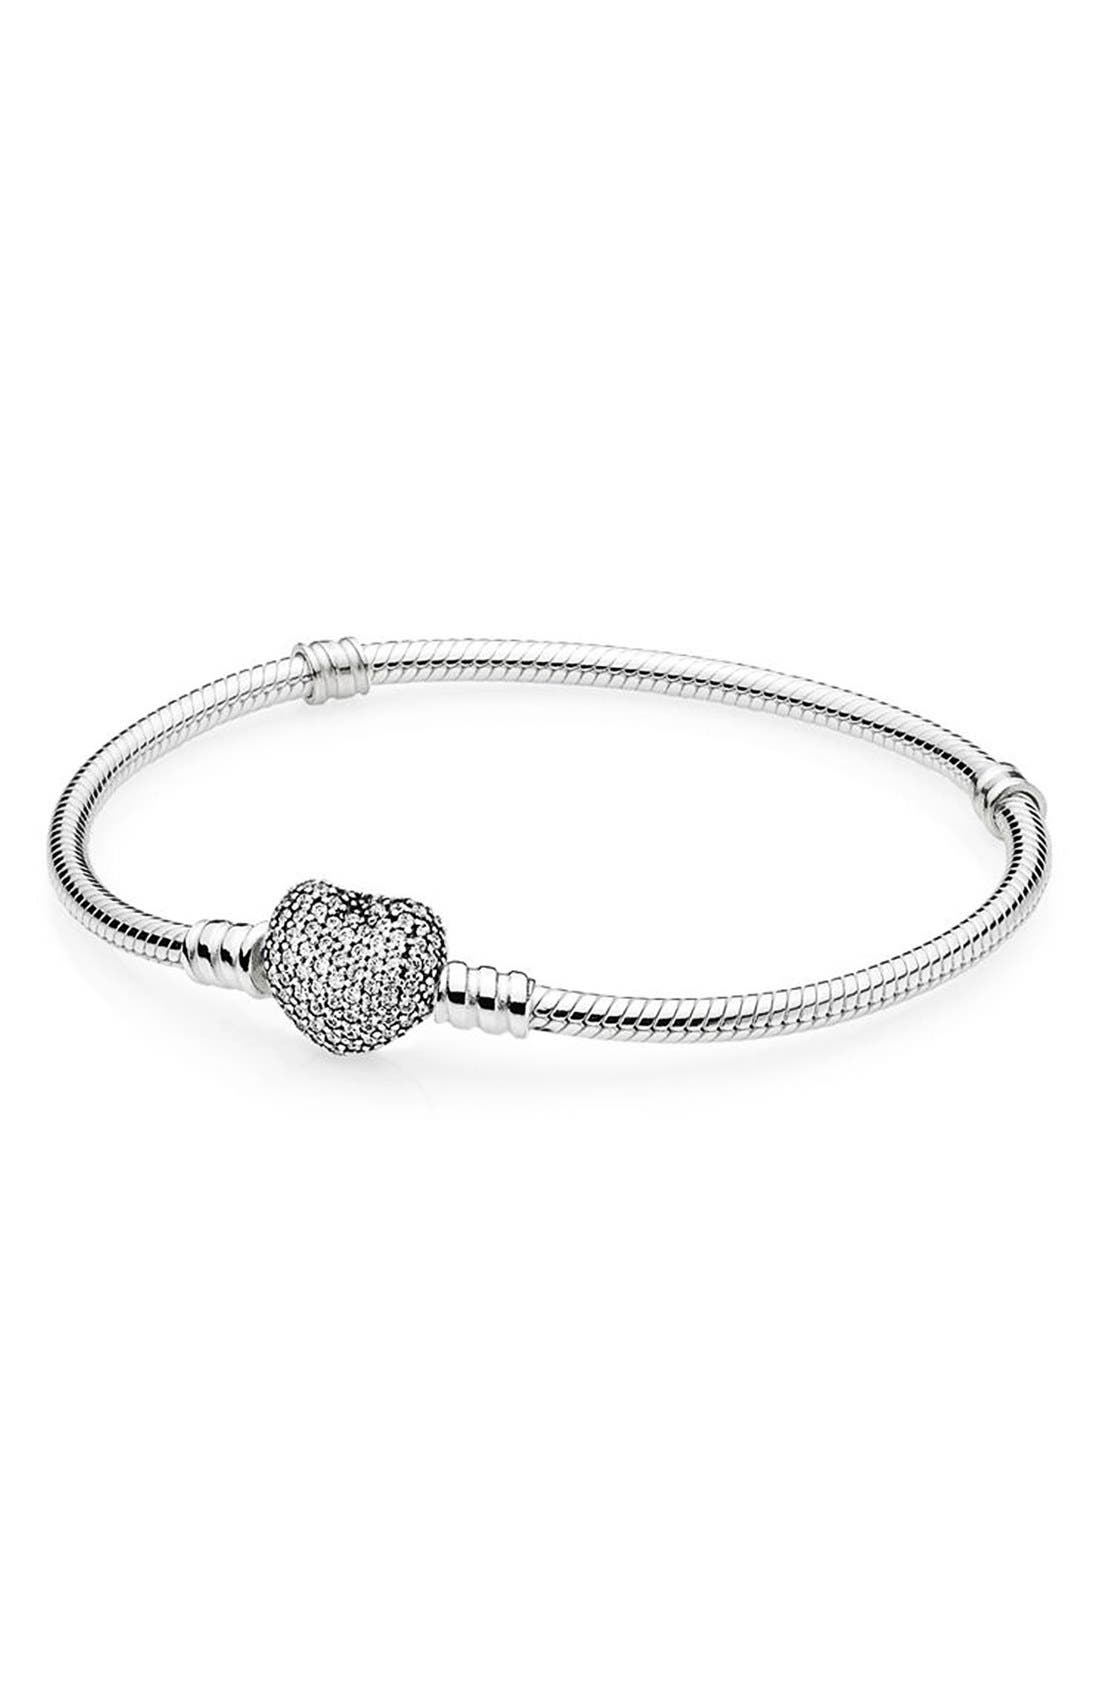 Main Image - PANDORA Pavé Heart Sterling Silver Charm Bracelet